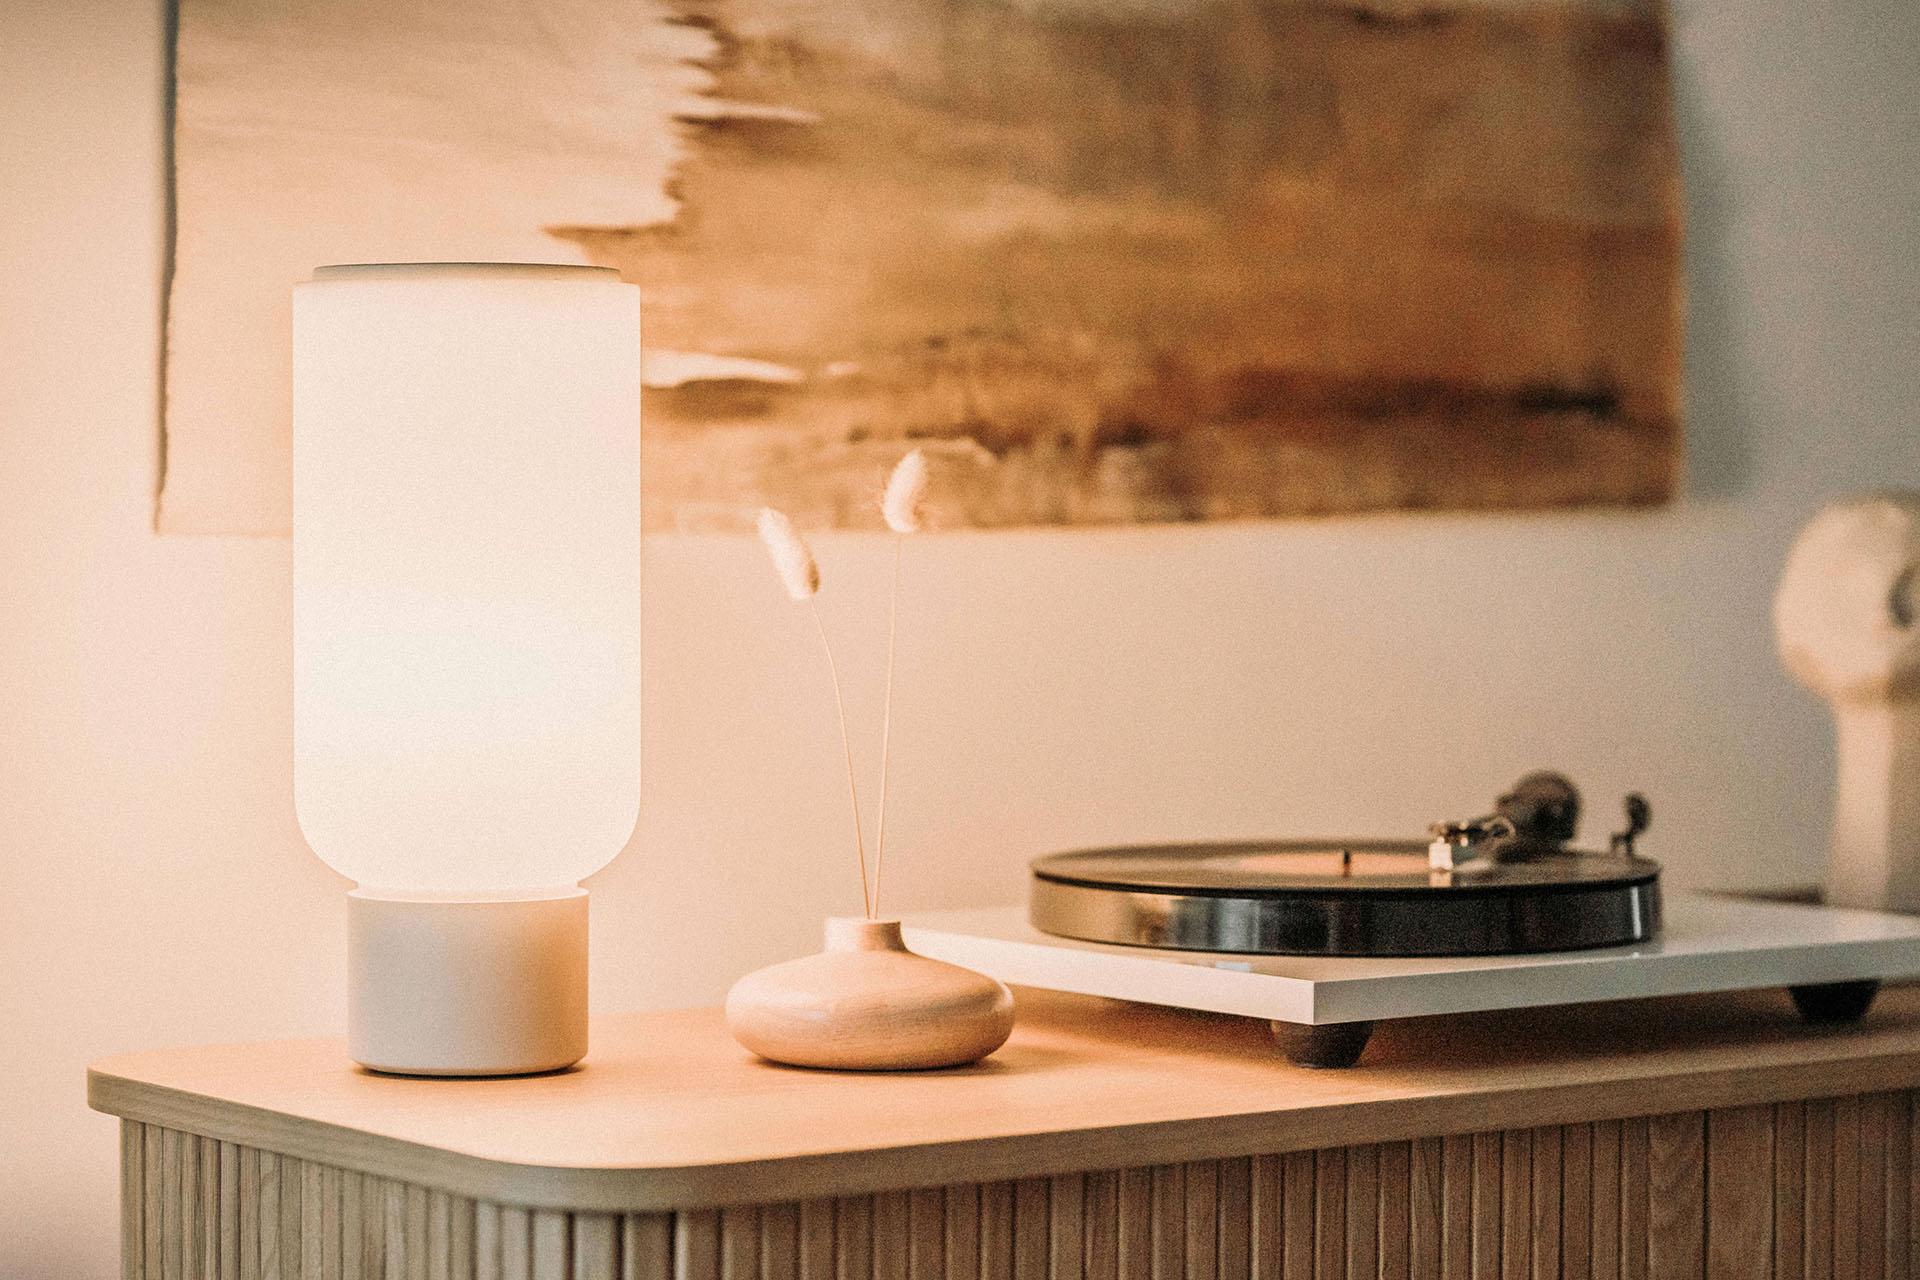 Arpeggio Table Light for Gantri, illuminated and sitting on a minimal sideboard